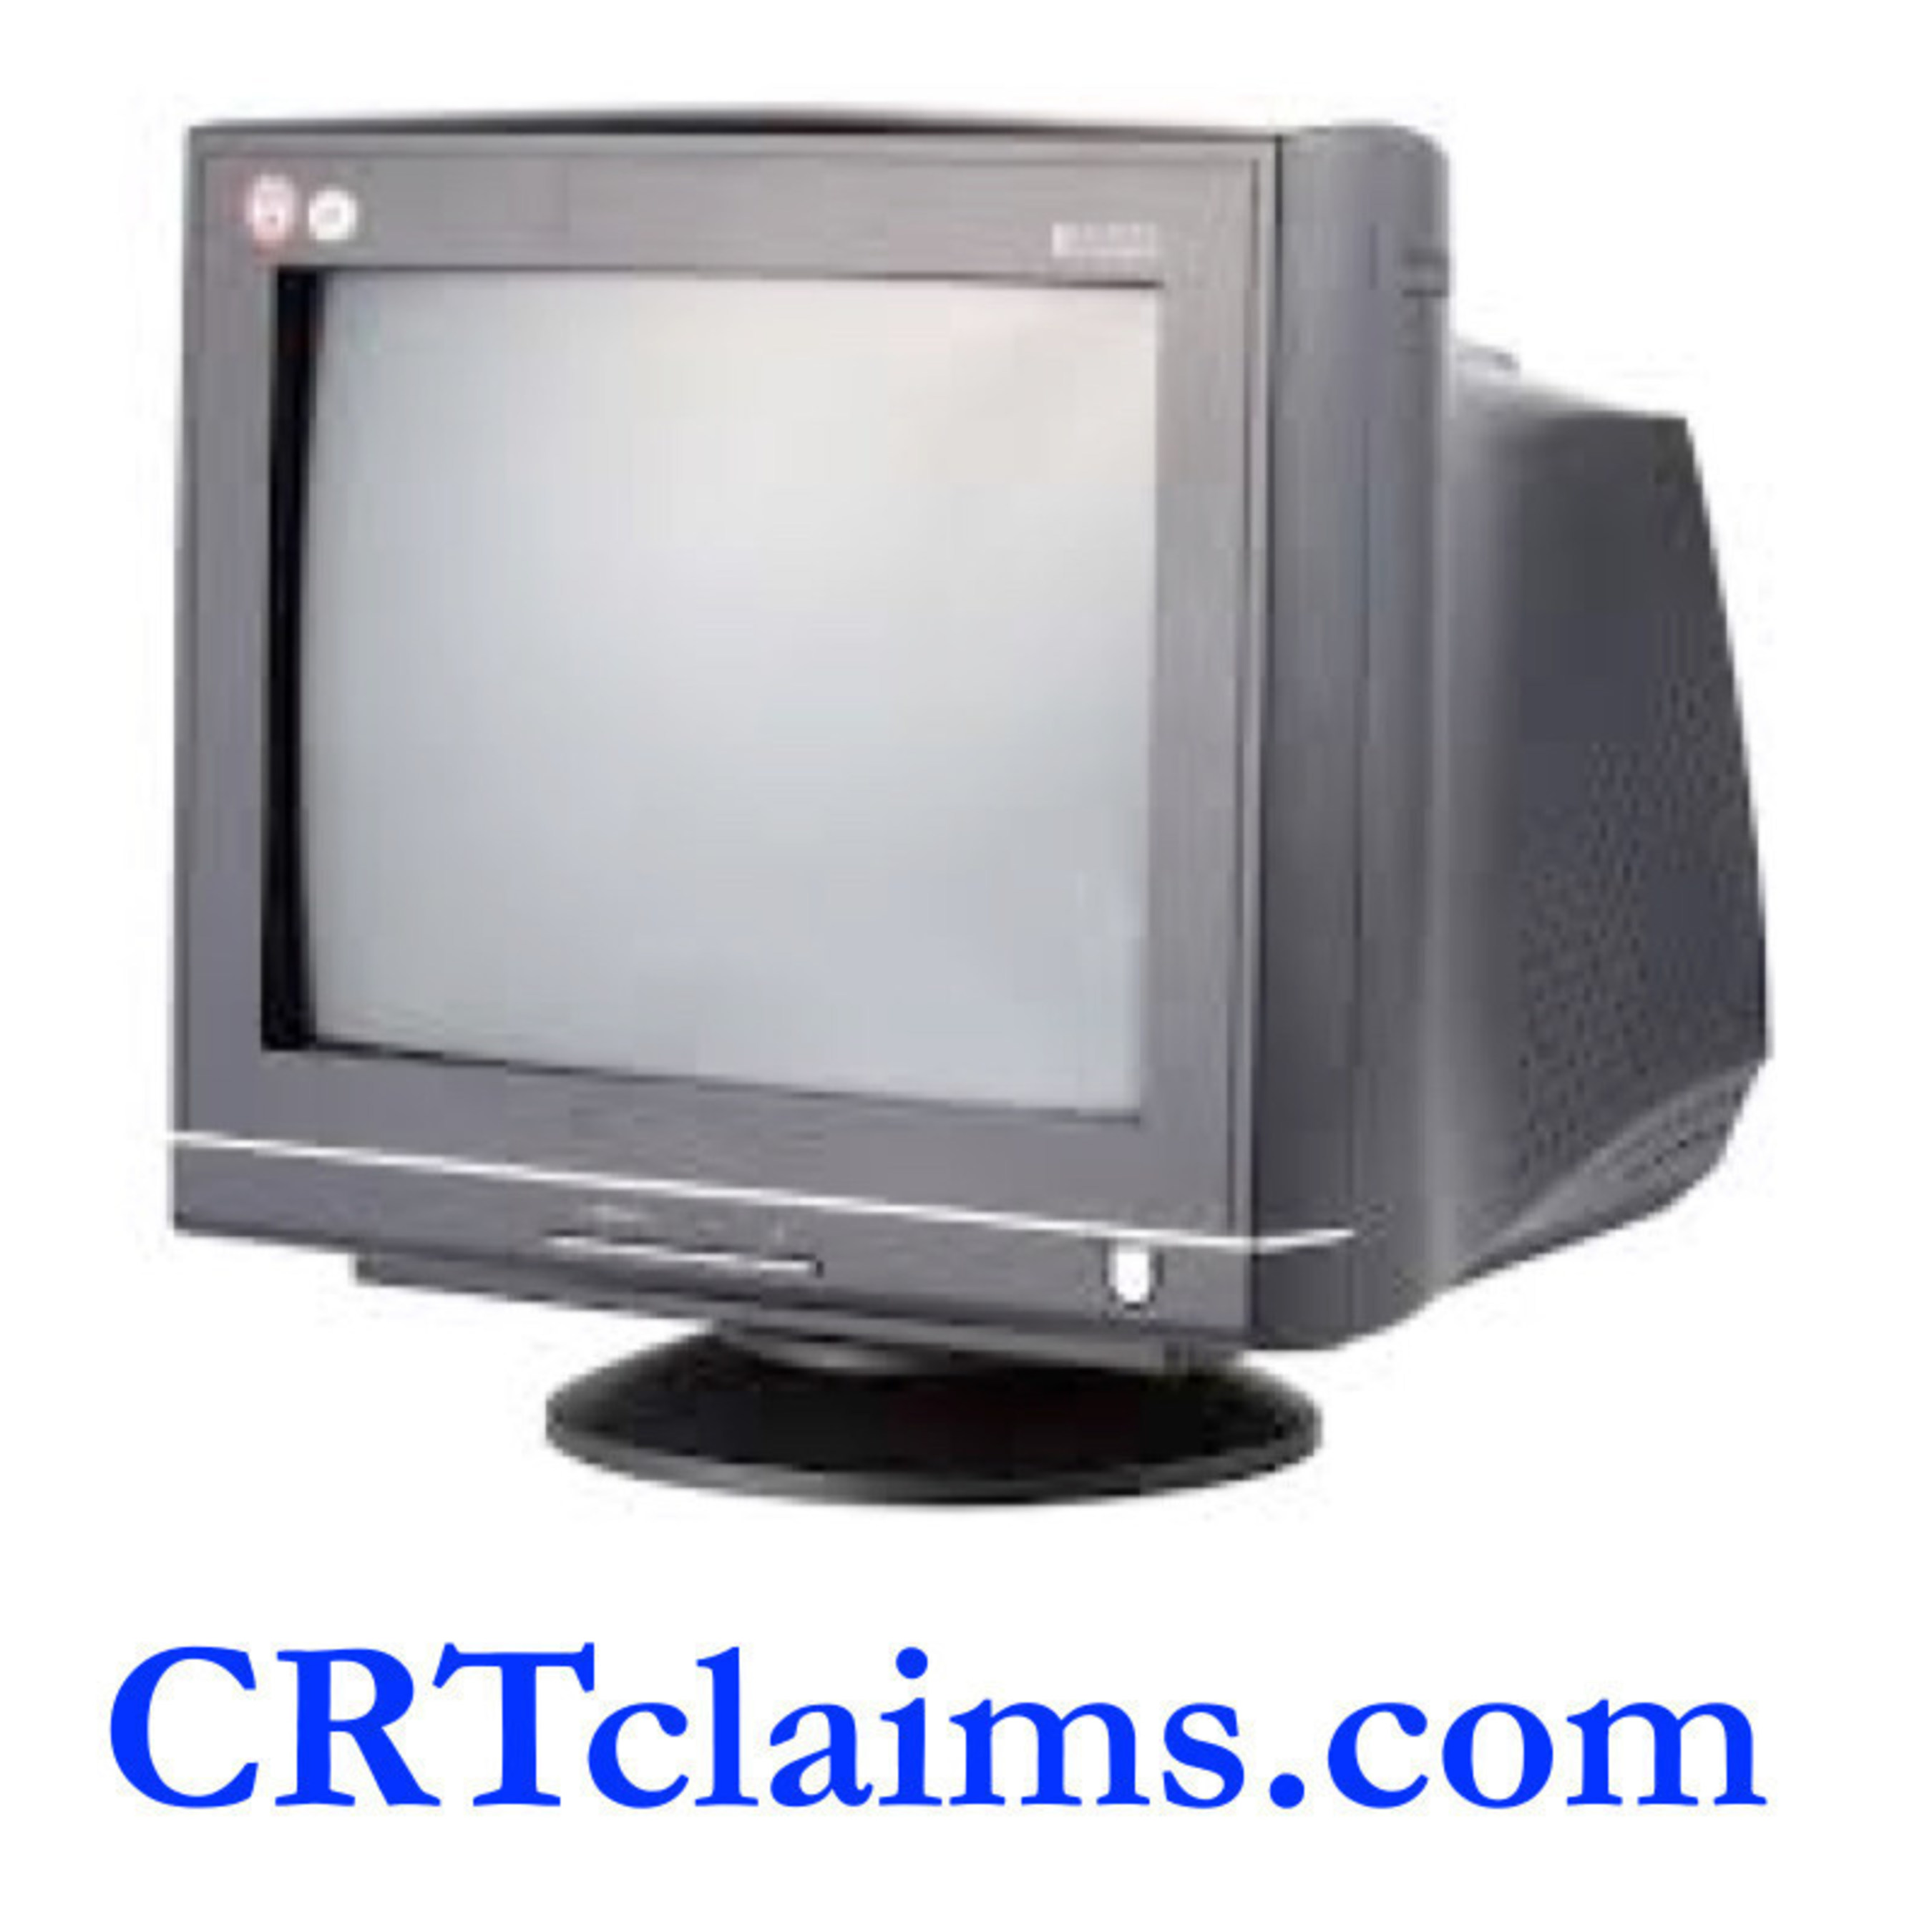 Aviso legal para compradores de productos CRT